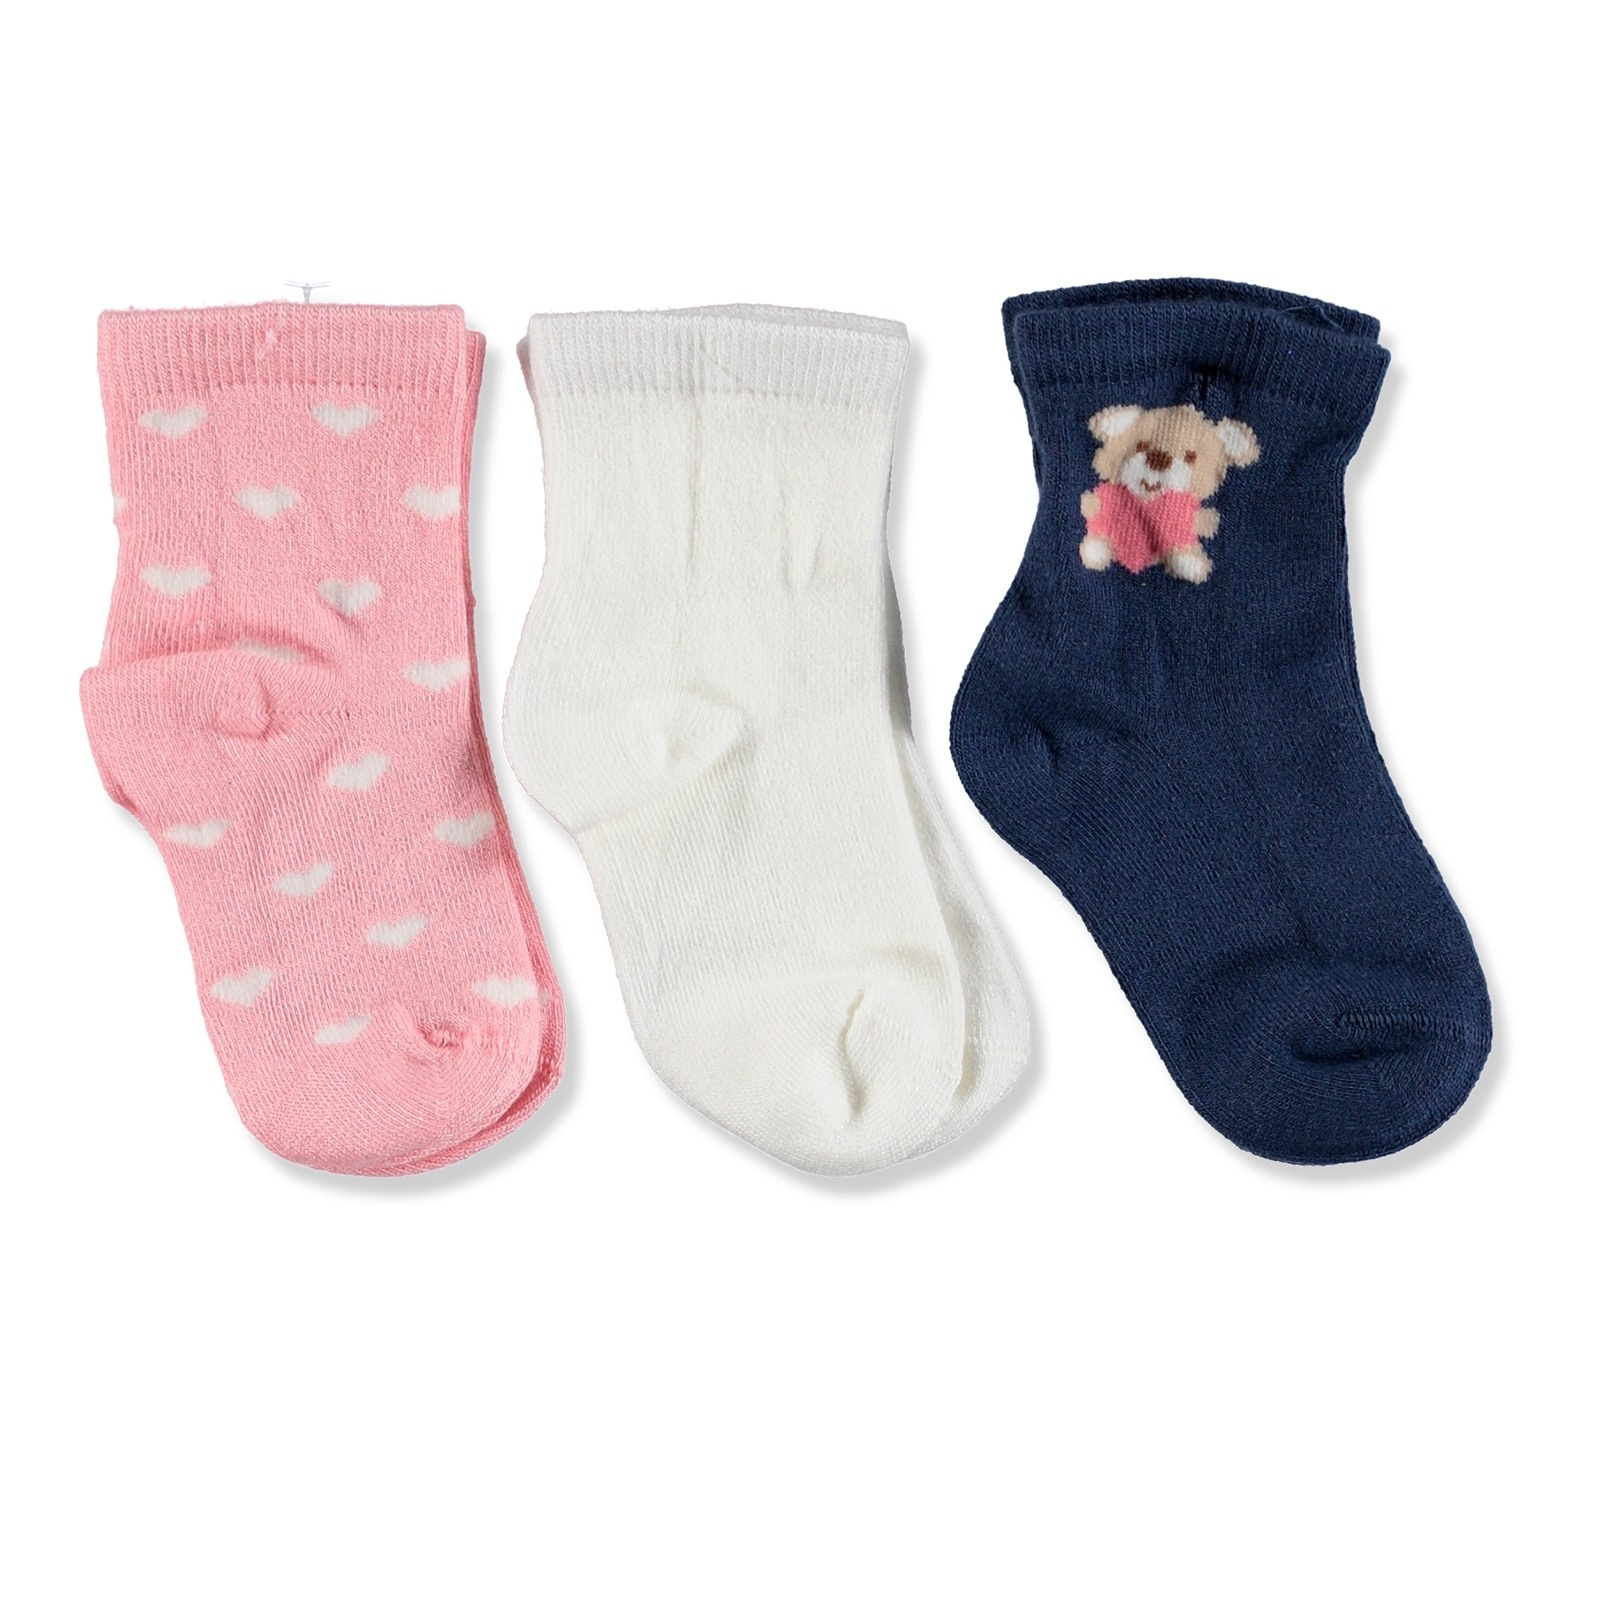 Ebebek Petit Minou 3 Pack Baby Socks Hearted Teddy Bear